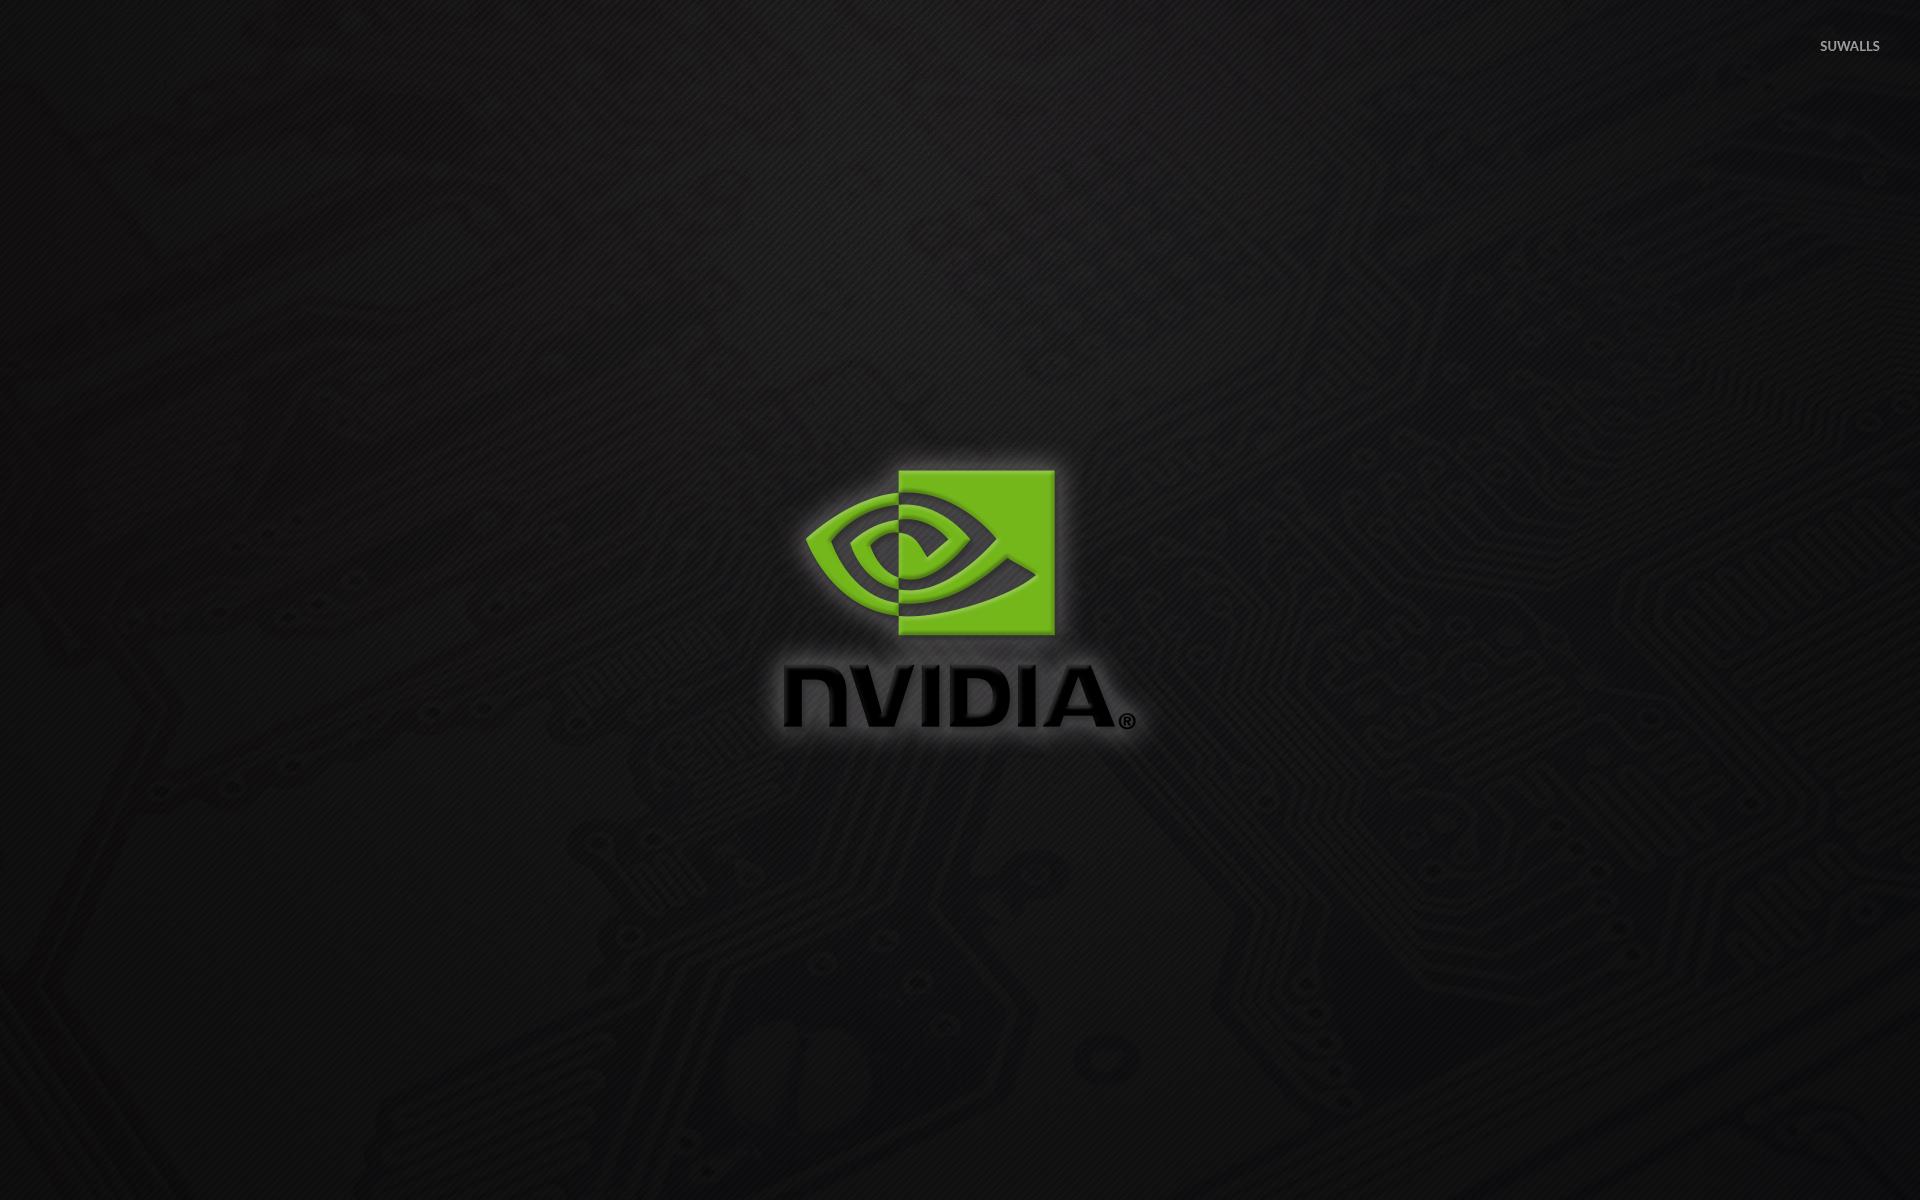 Nvidia simple 3D Computer Wallpapers, Desktop Backgrounds ...